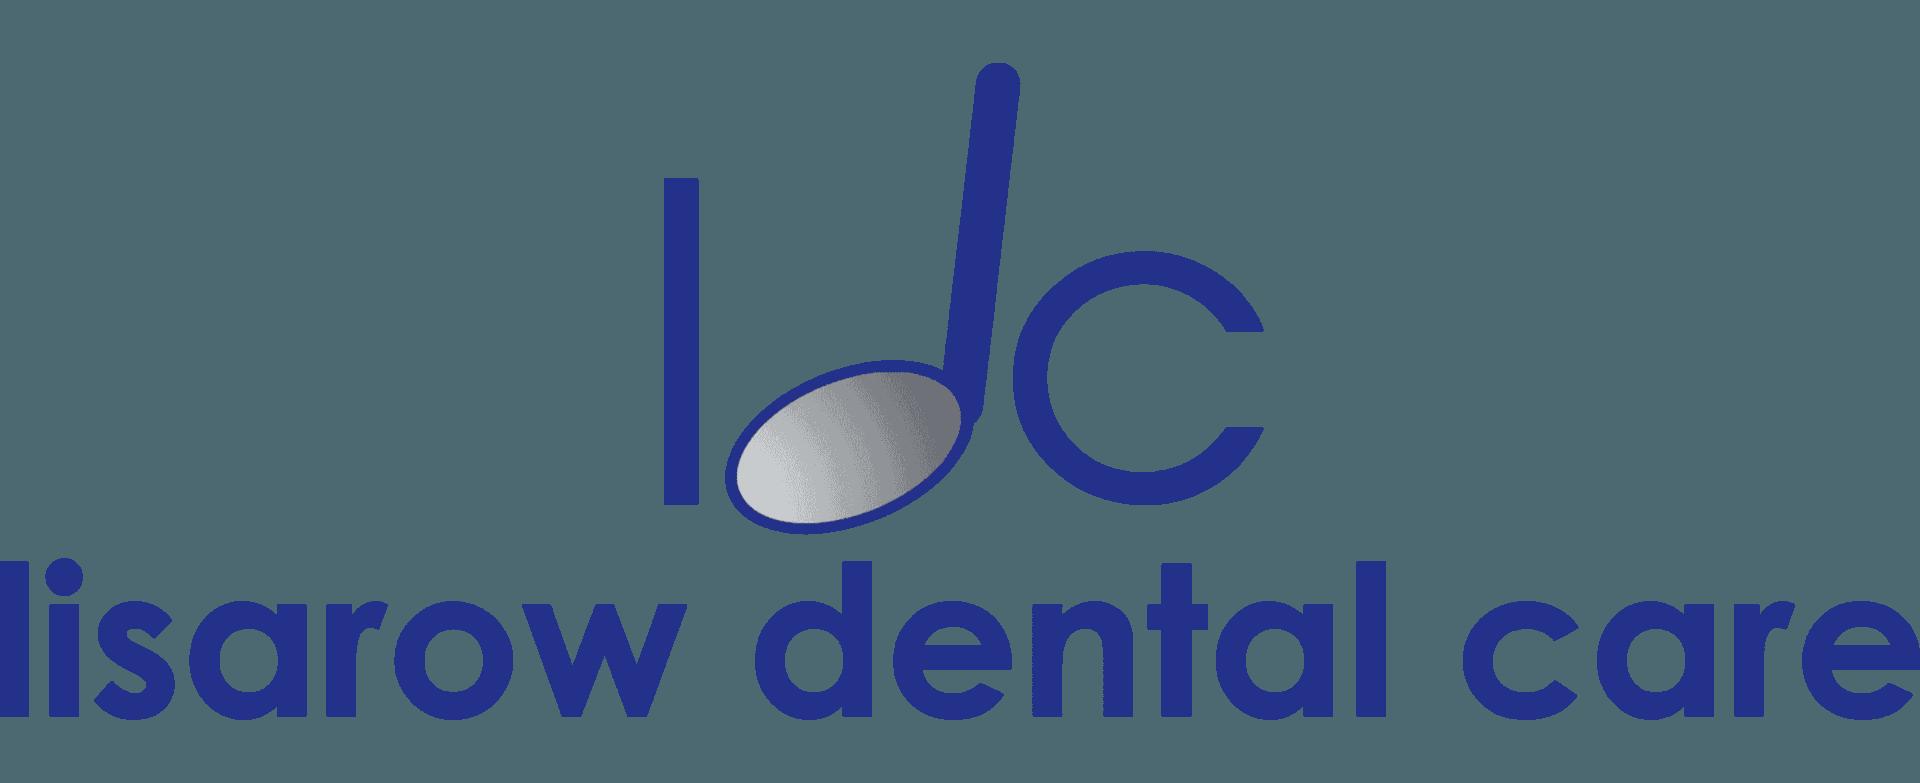 Lisarow Dental Care